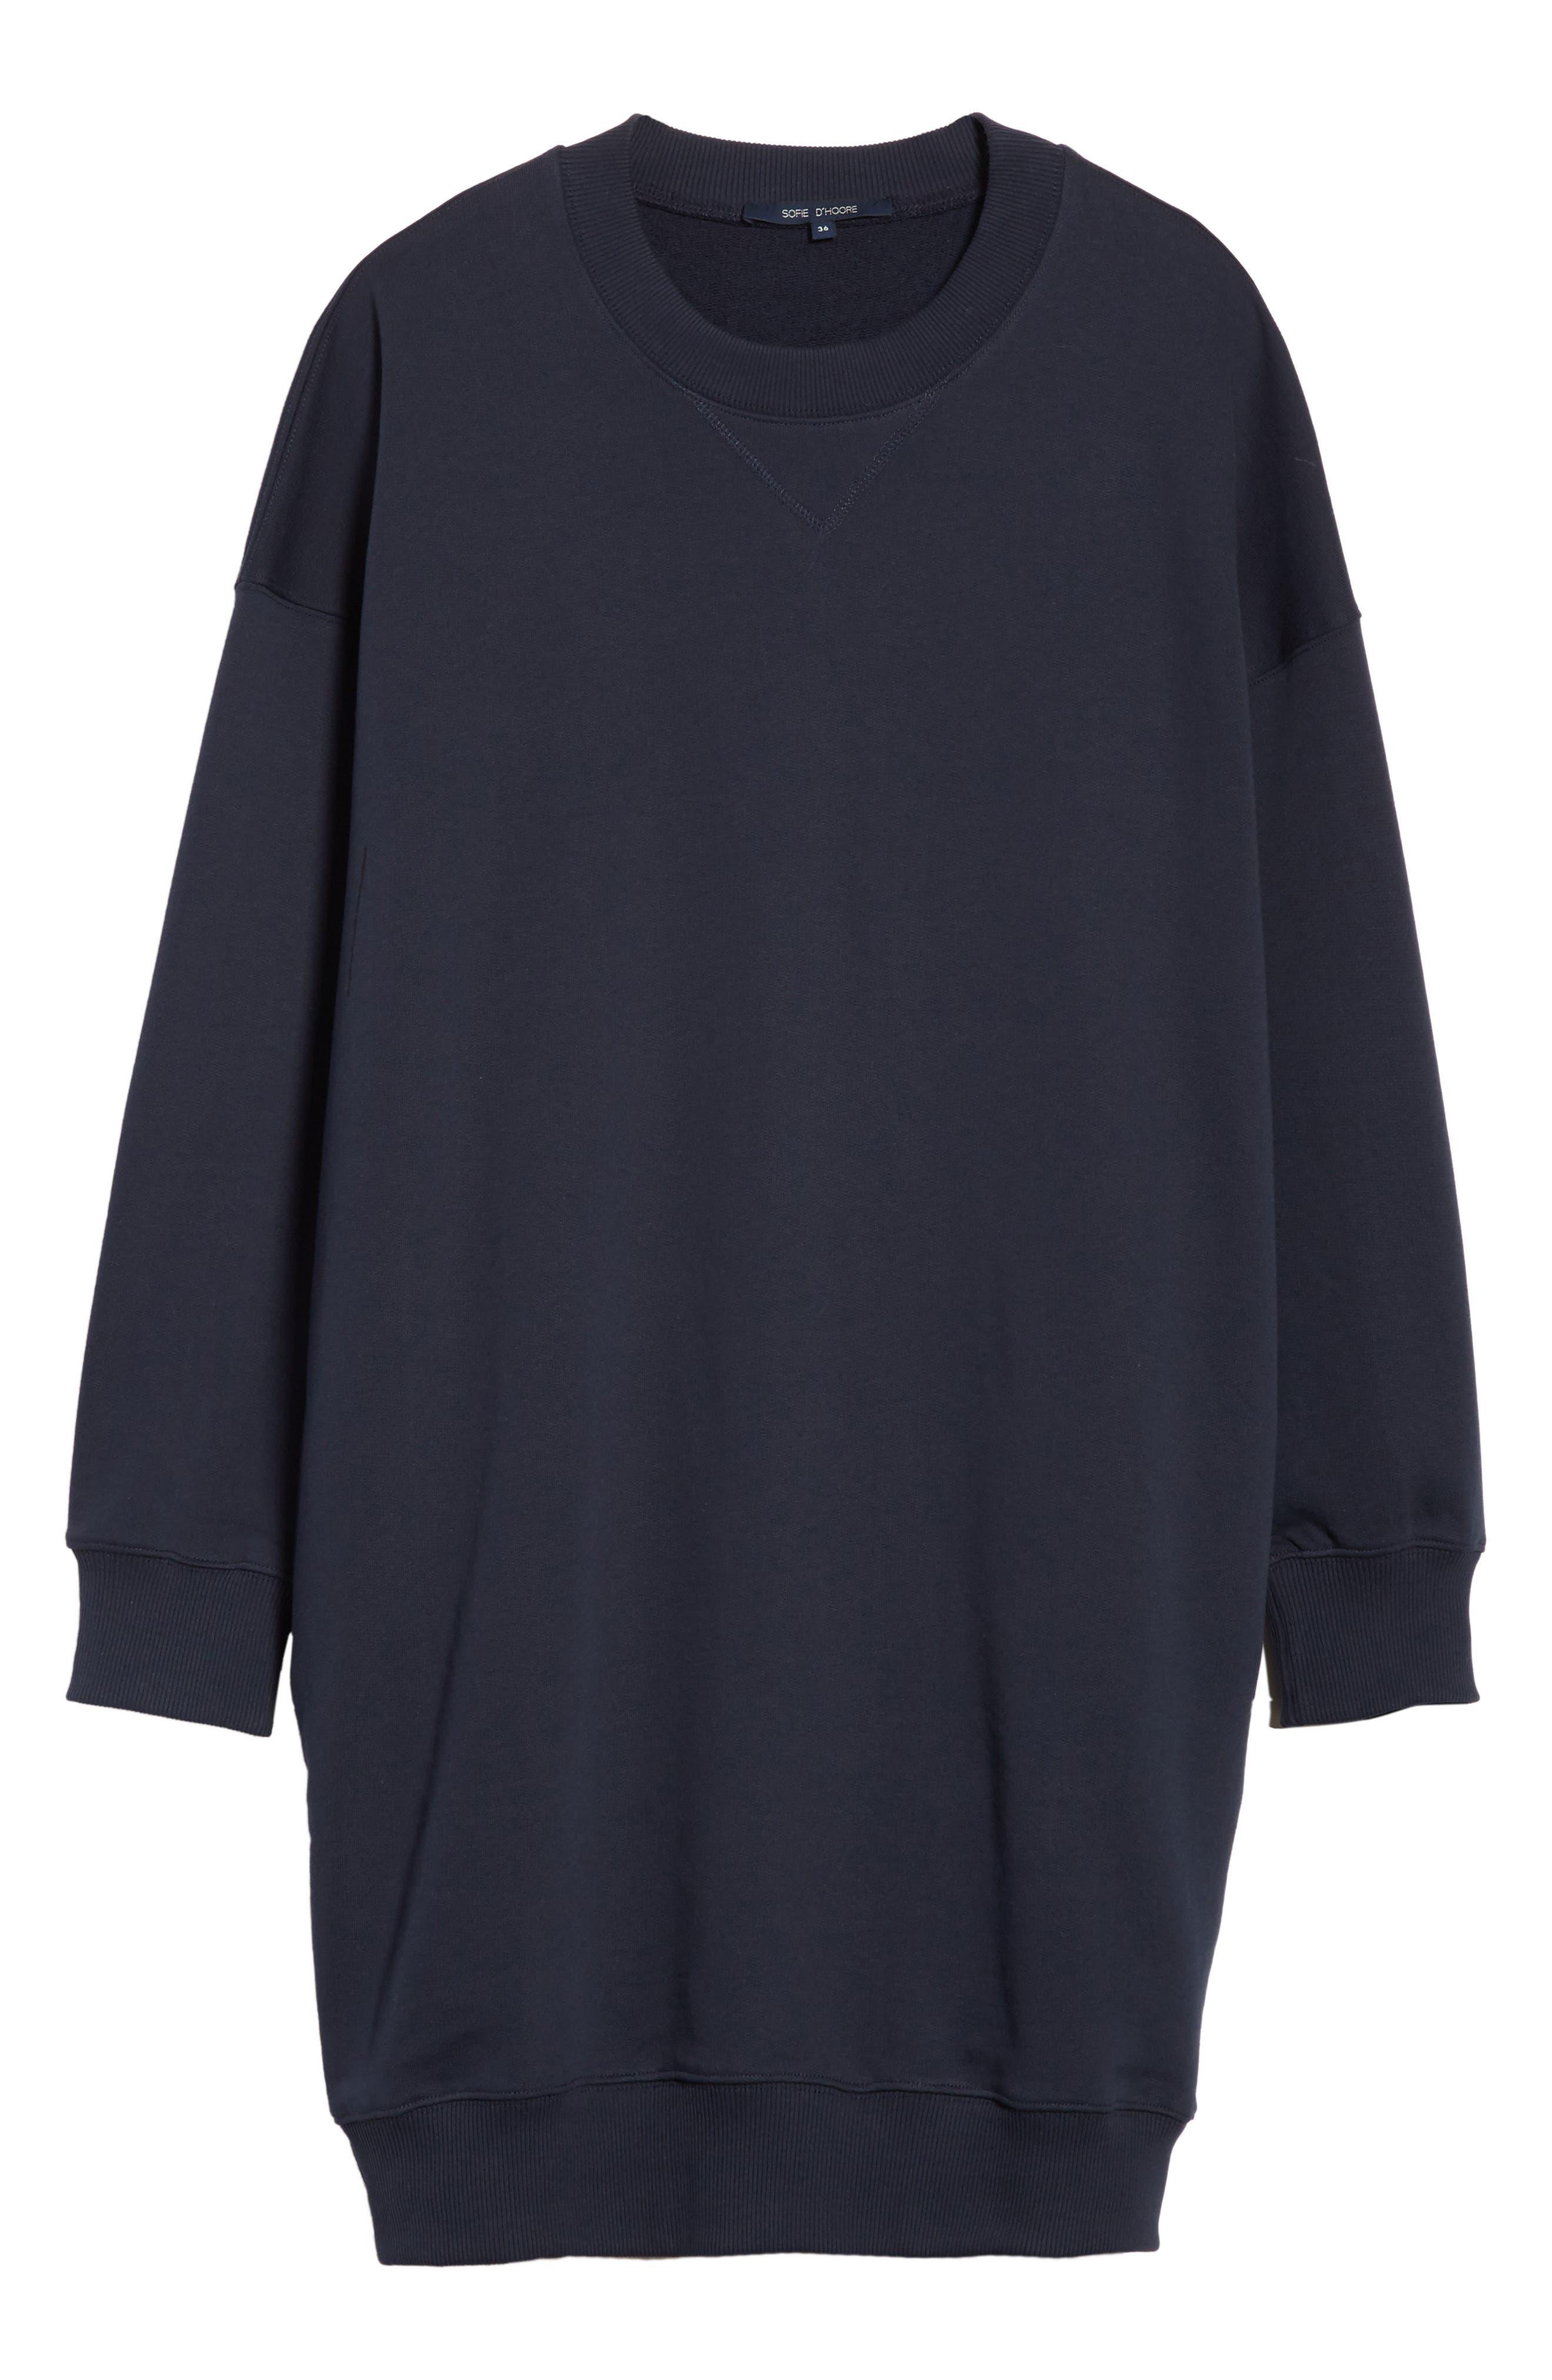 Sweatshirt Dress,                             Alternate thumbnail 7, color,                             Navy